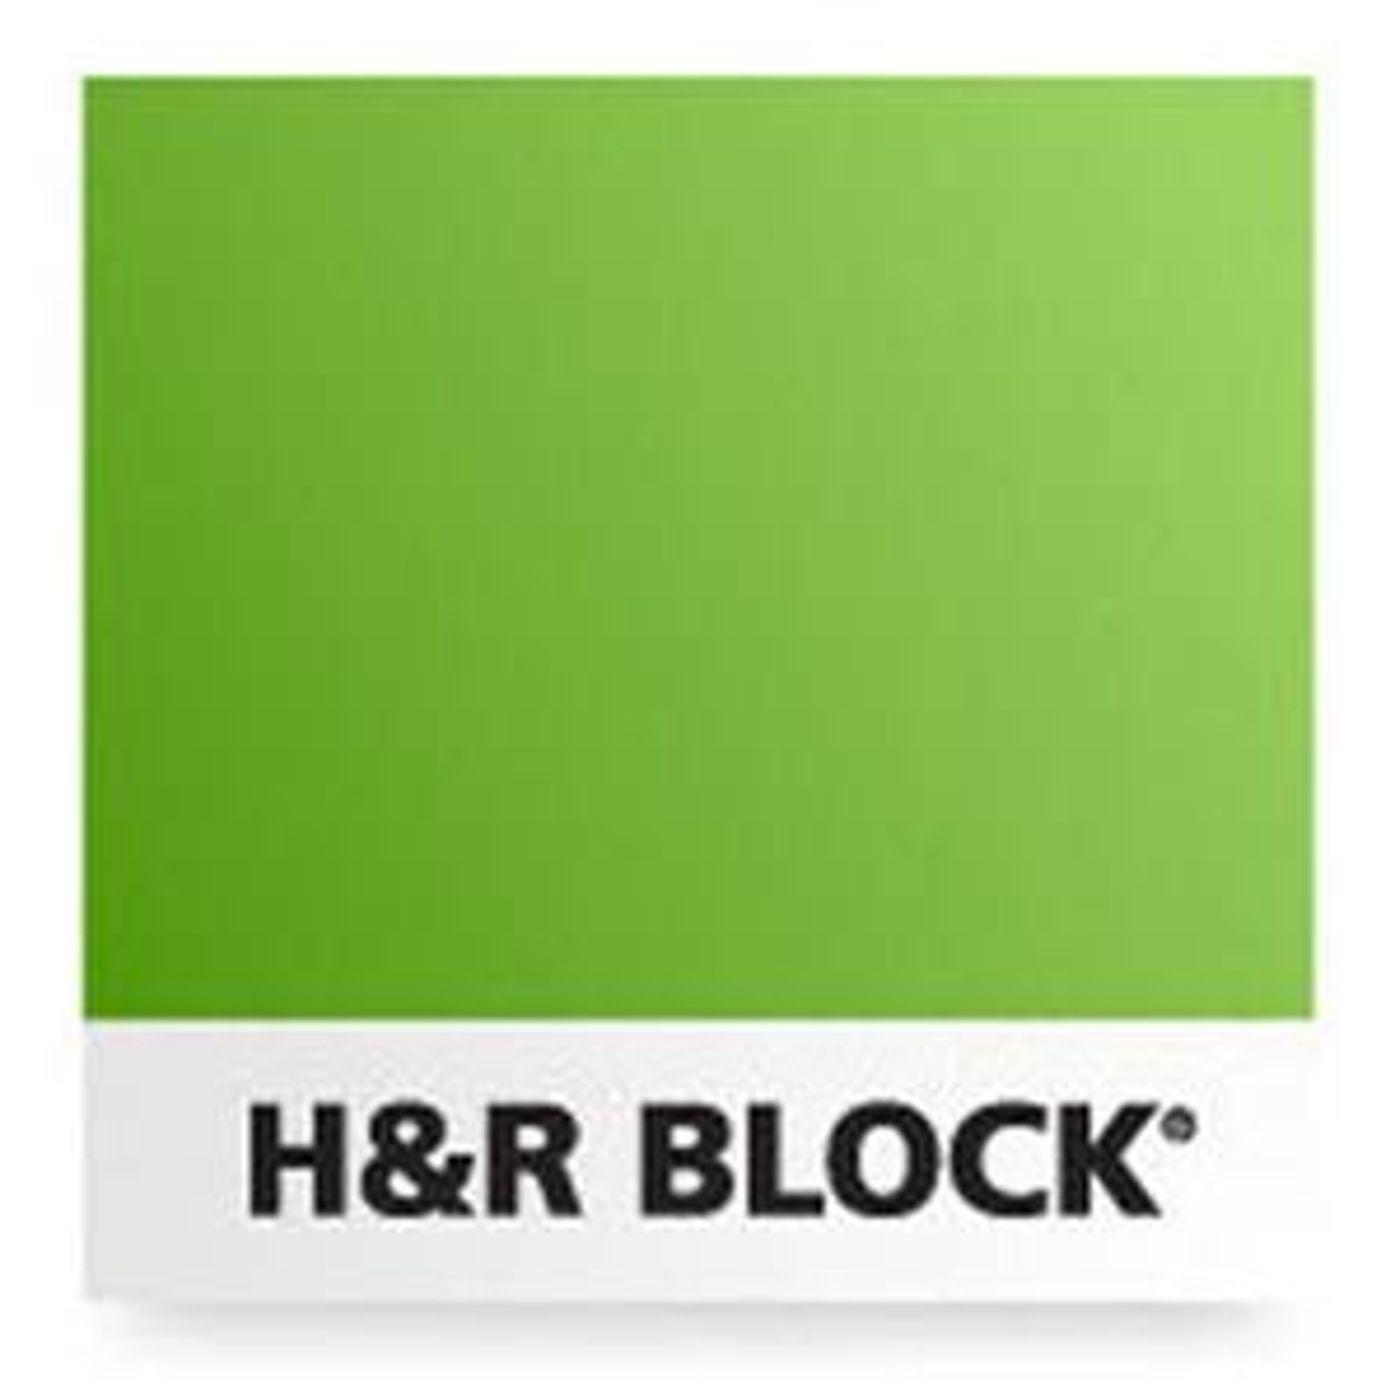 H&R Block Dollars and Sense - Financial Literacy Month